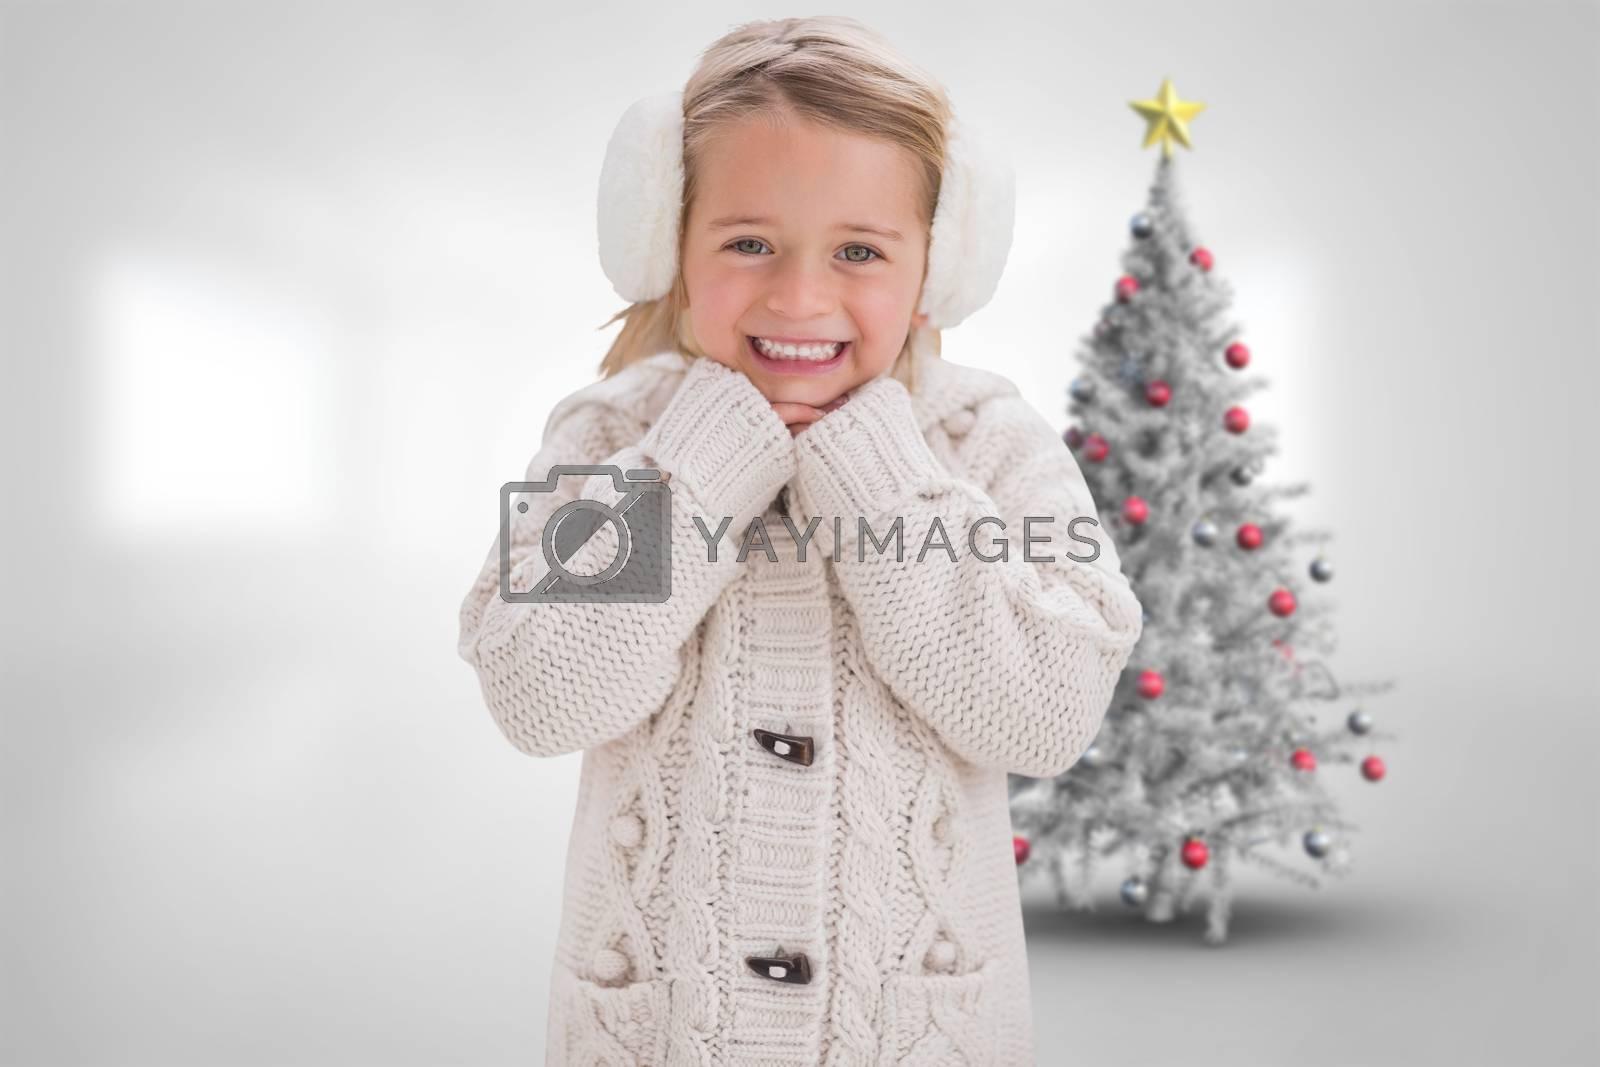 Composite image of cute girl in ear muffs by Wavebreakmedia